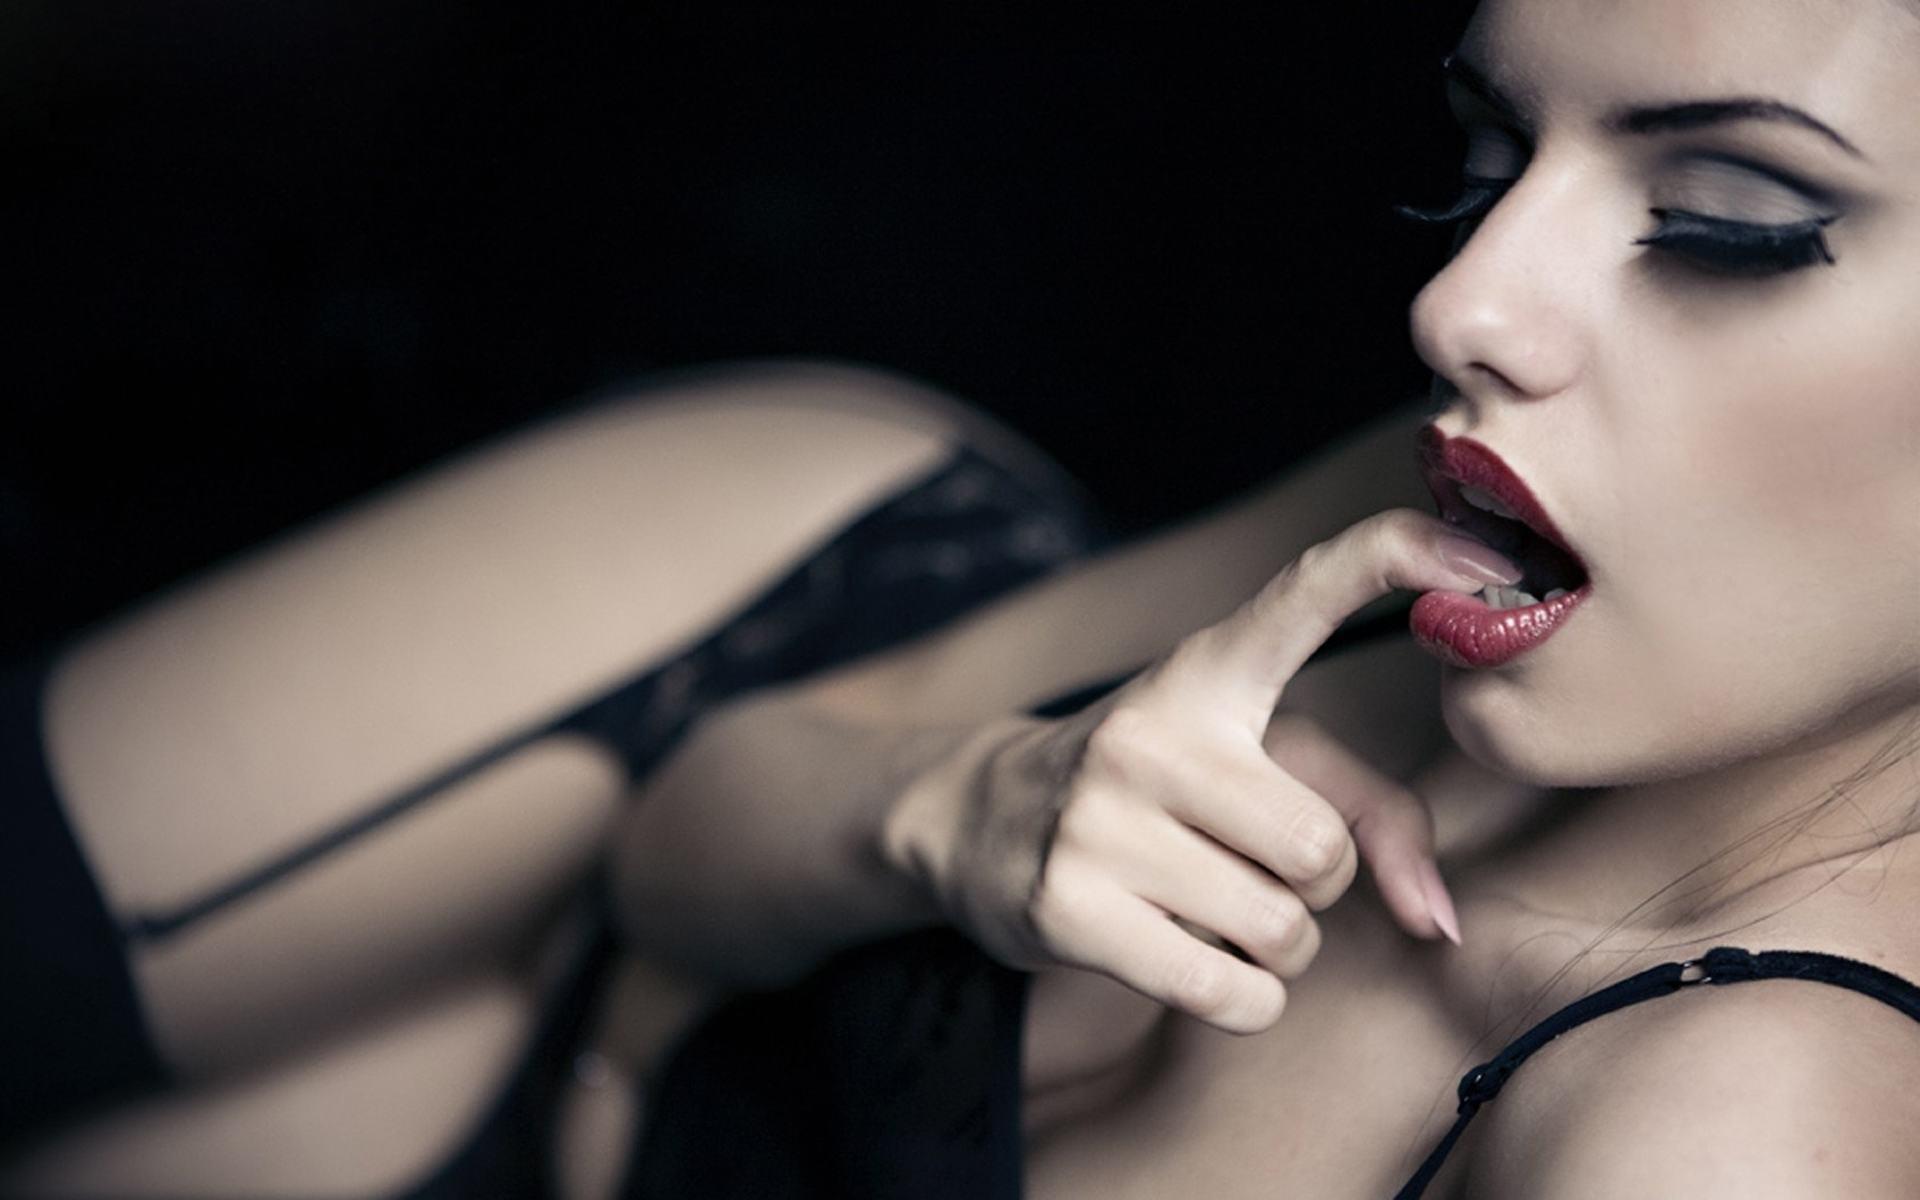 Превосходство в сексе смотреть онлайн 20 фотография